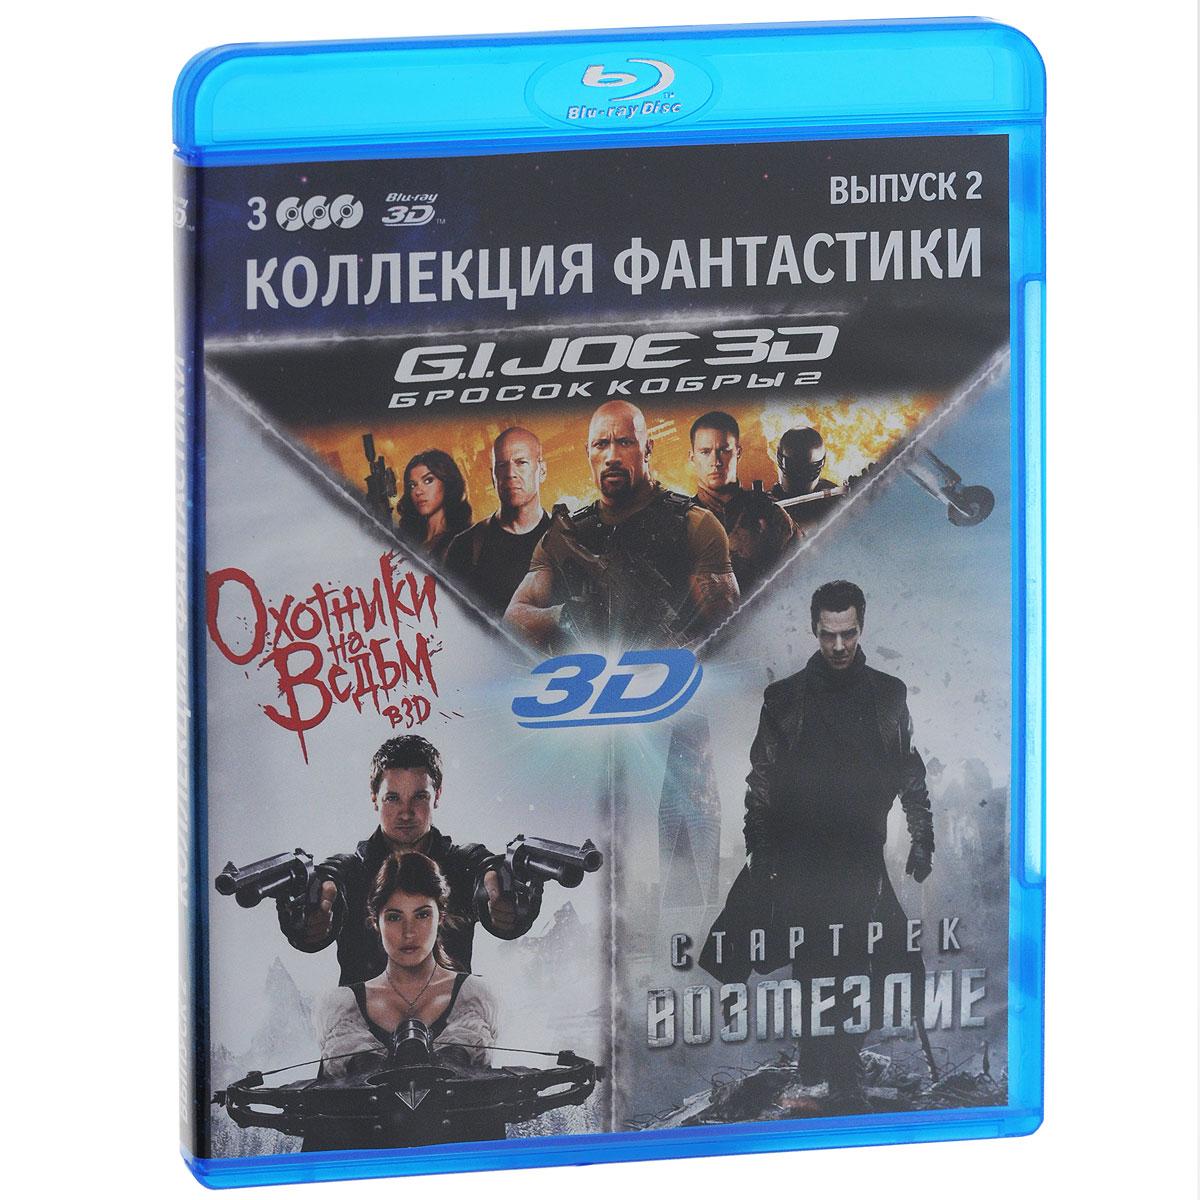 G.I. Joe: Бросок кобры 2 / Охотники на ведьм / Стартрек: Возмездие (3 Blu-ray) bad company live at wembley blu ray